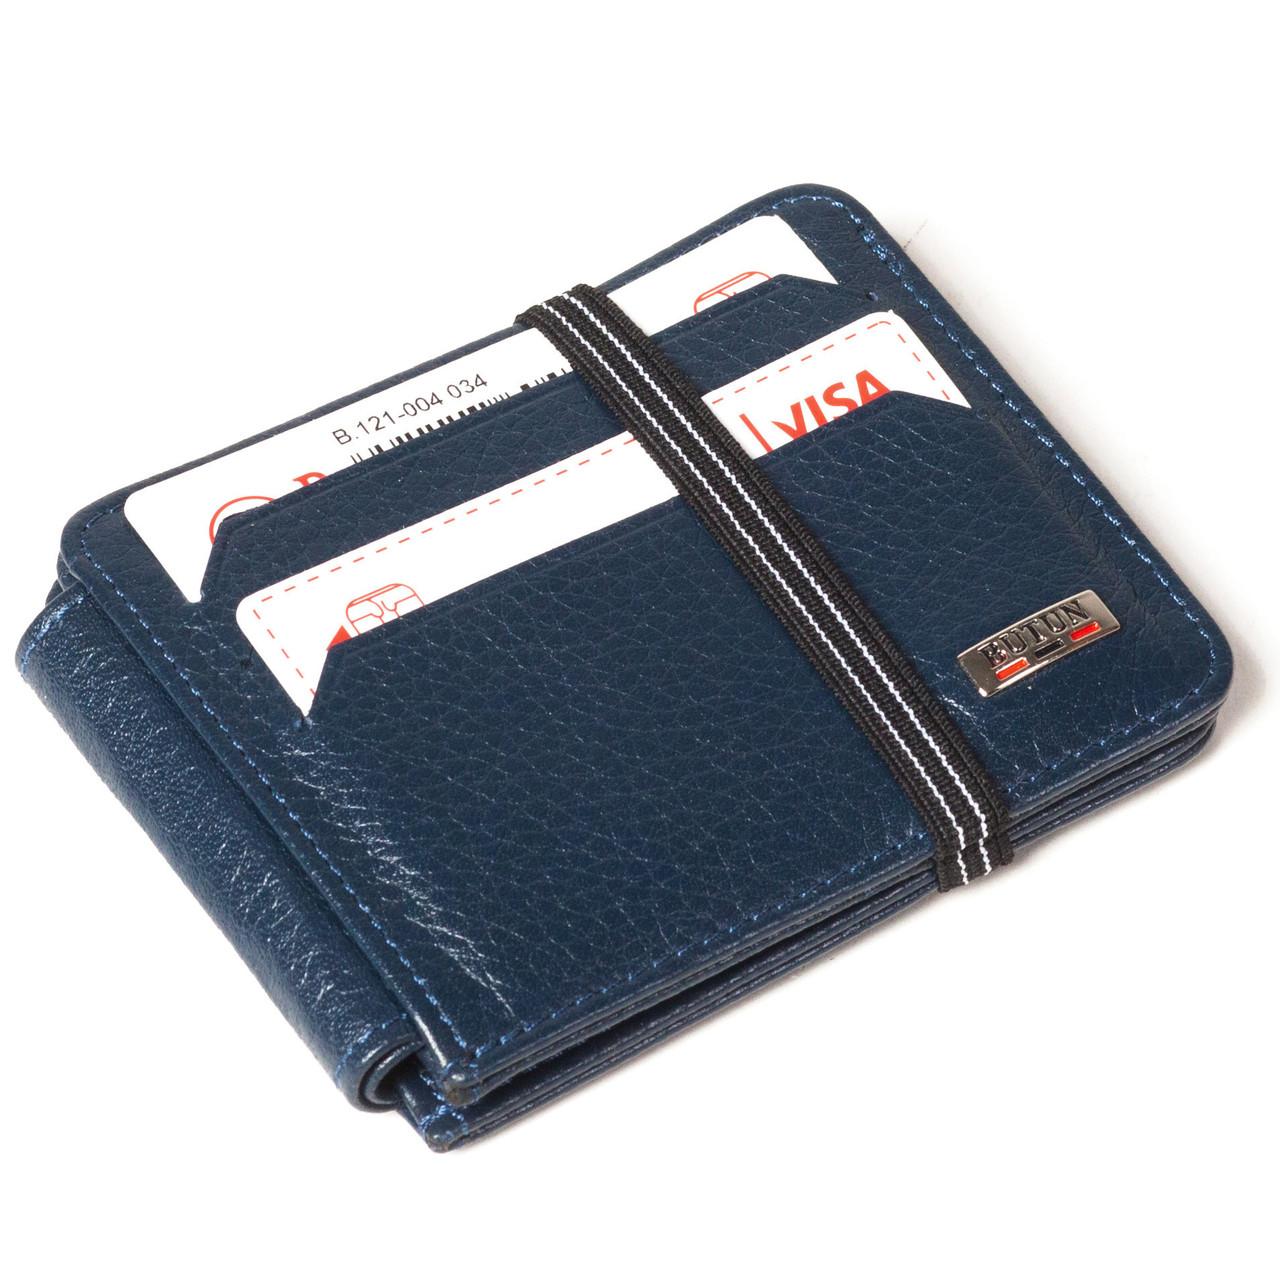 Кошелек-кредитница Butun 121-004-034 кожаный синий